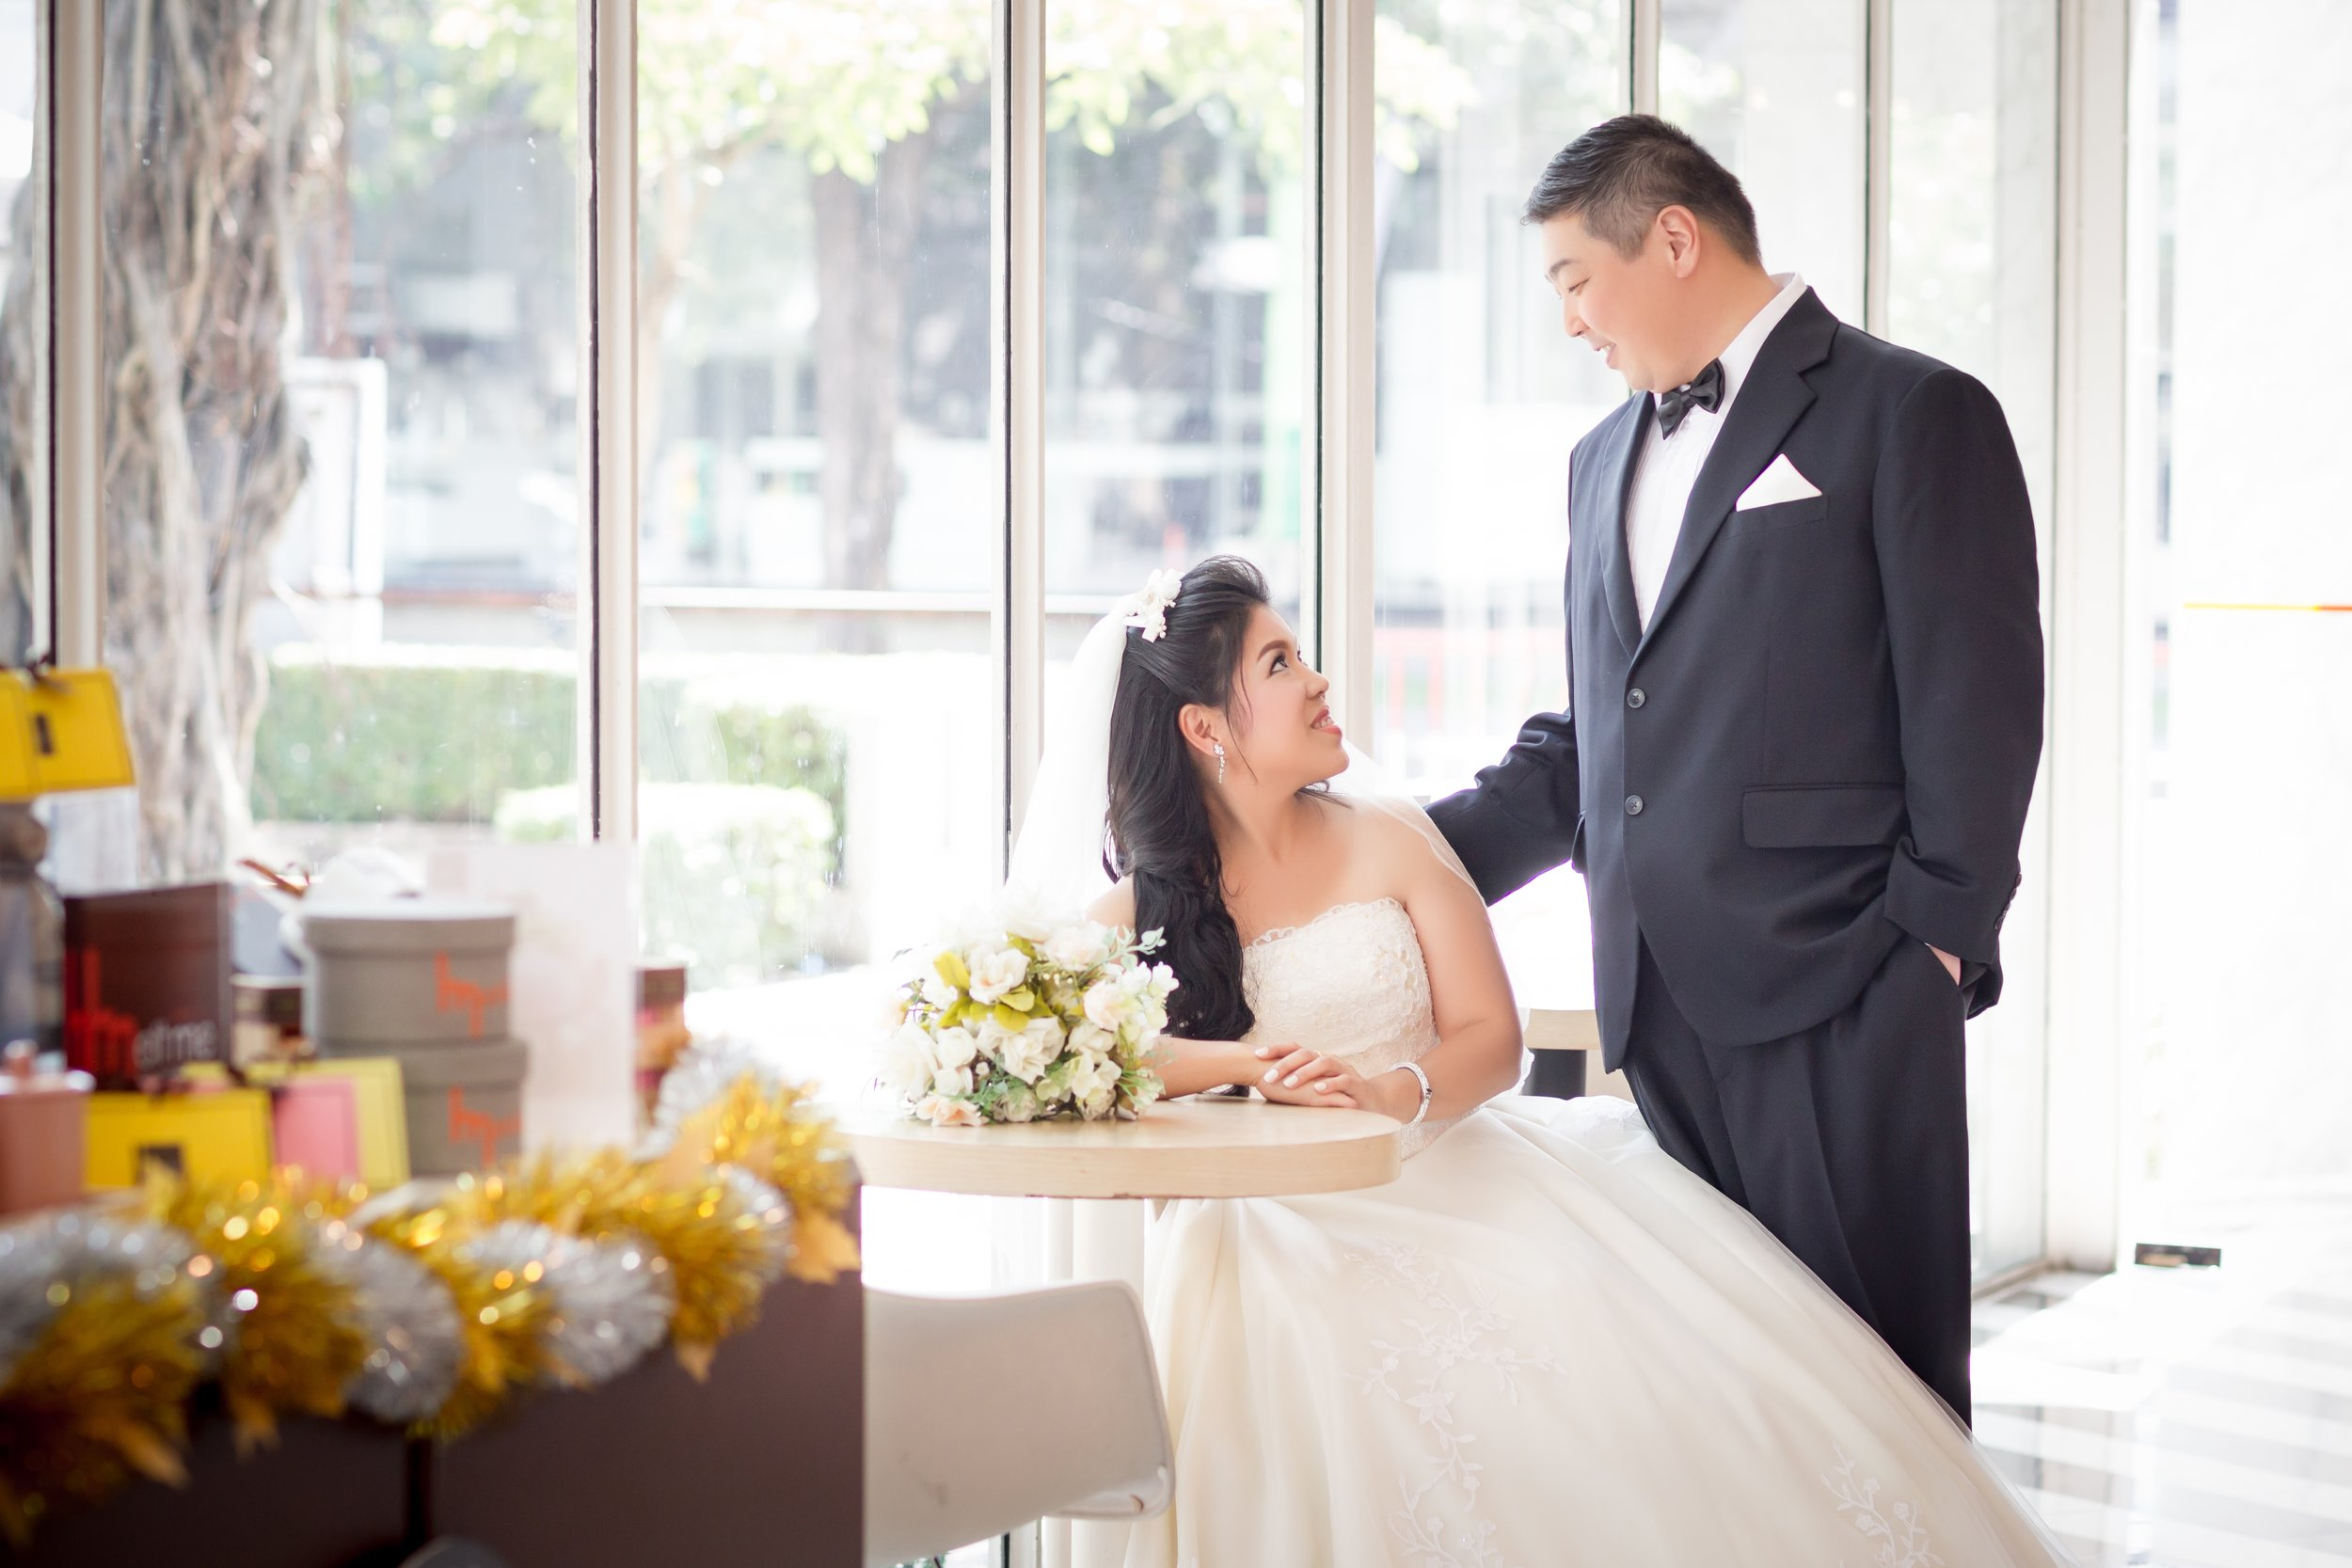 Wedding studio pictures